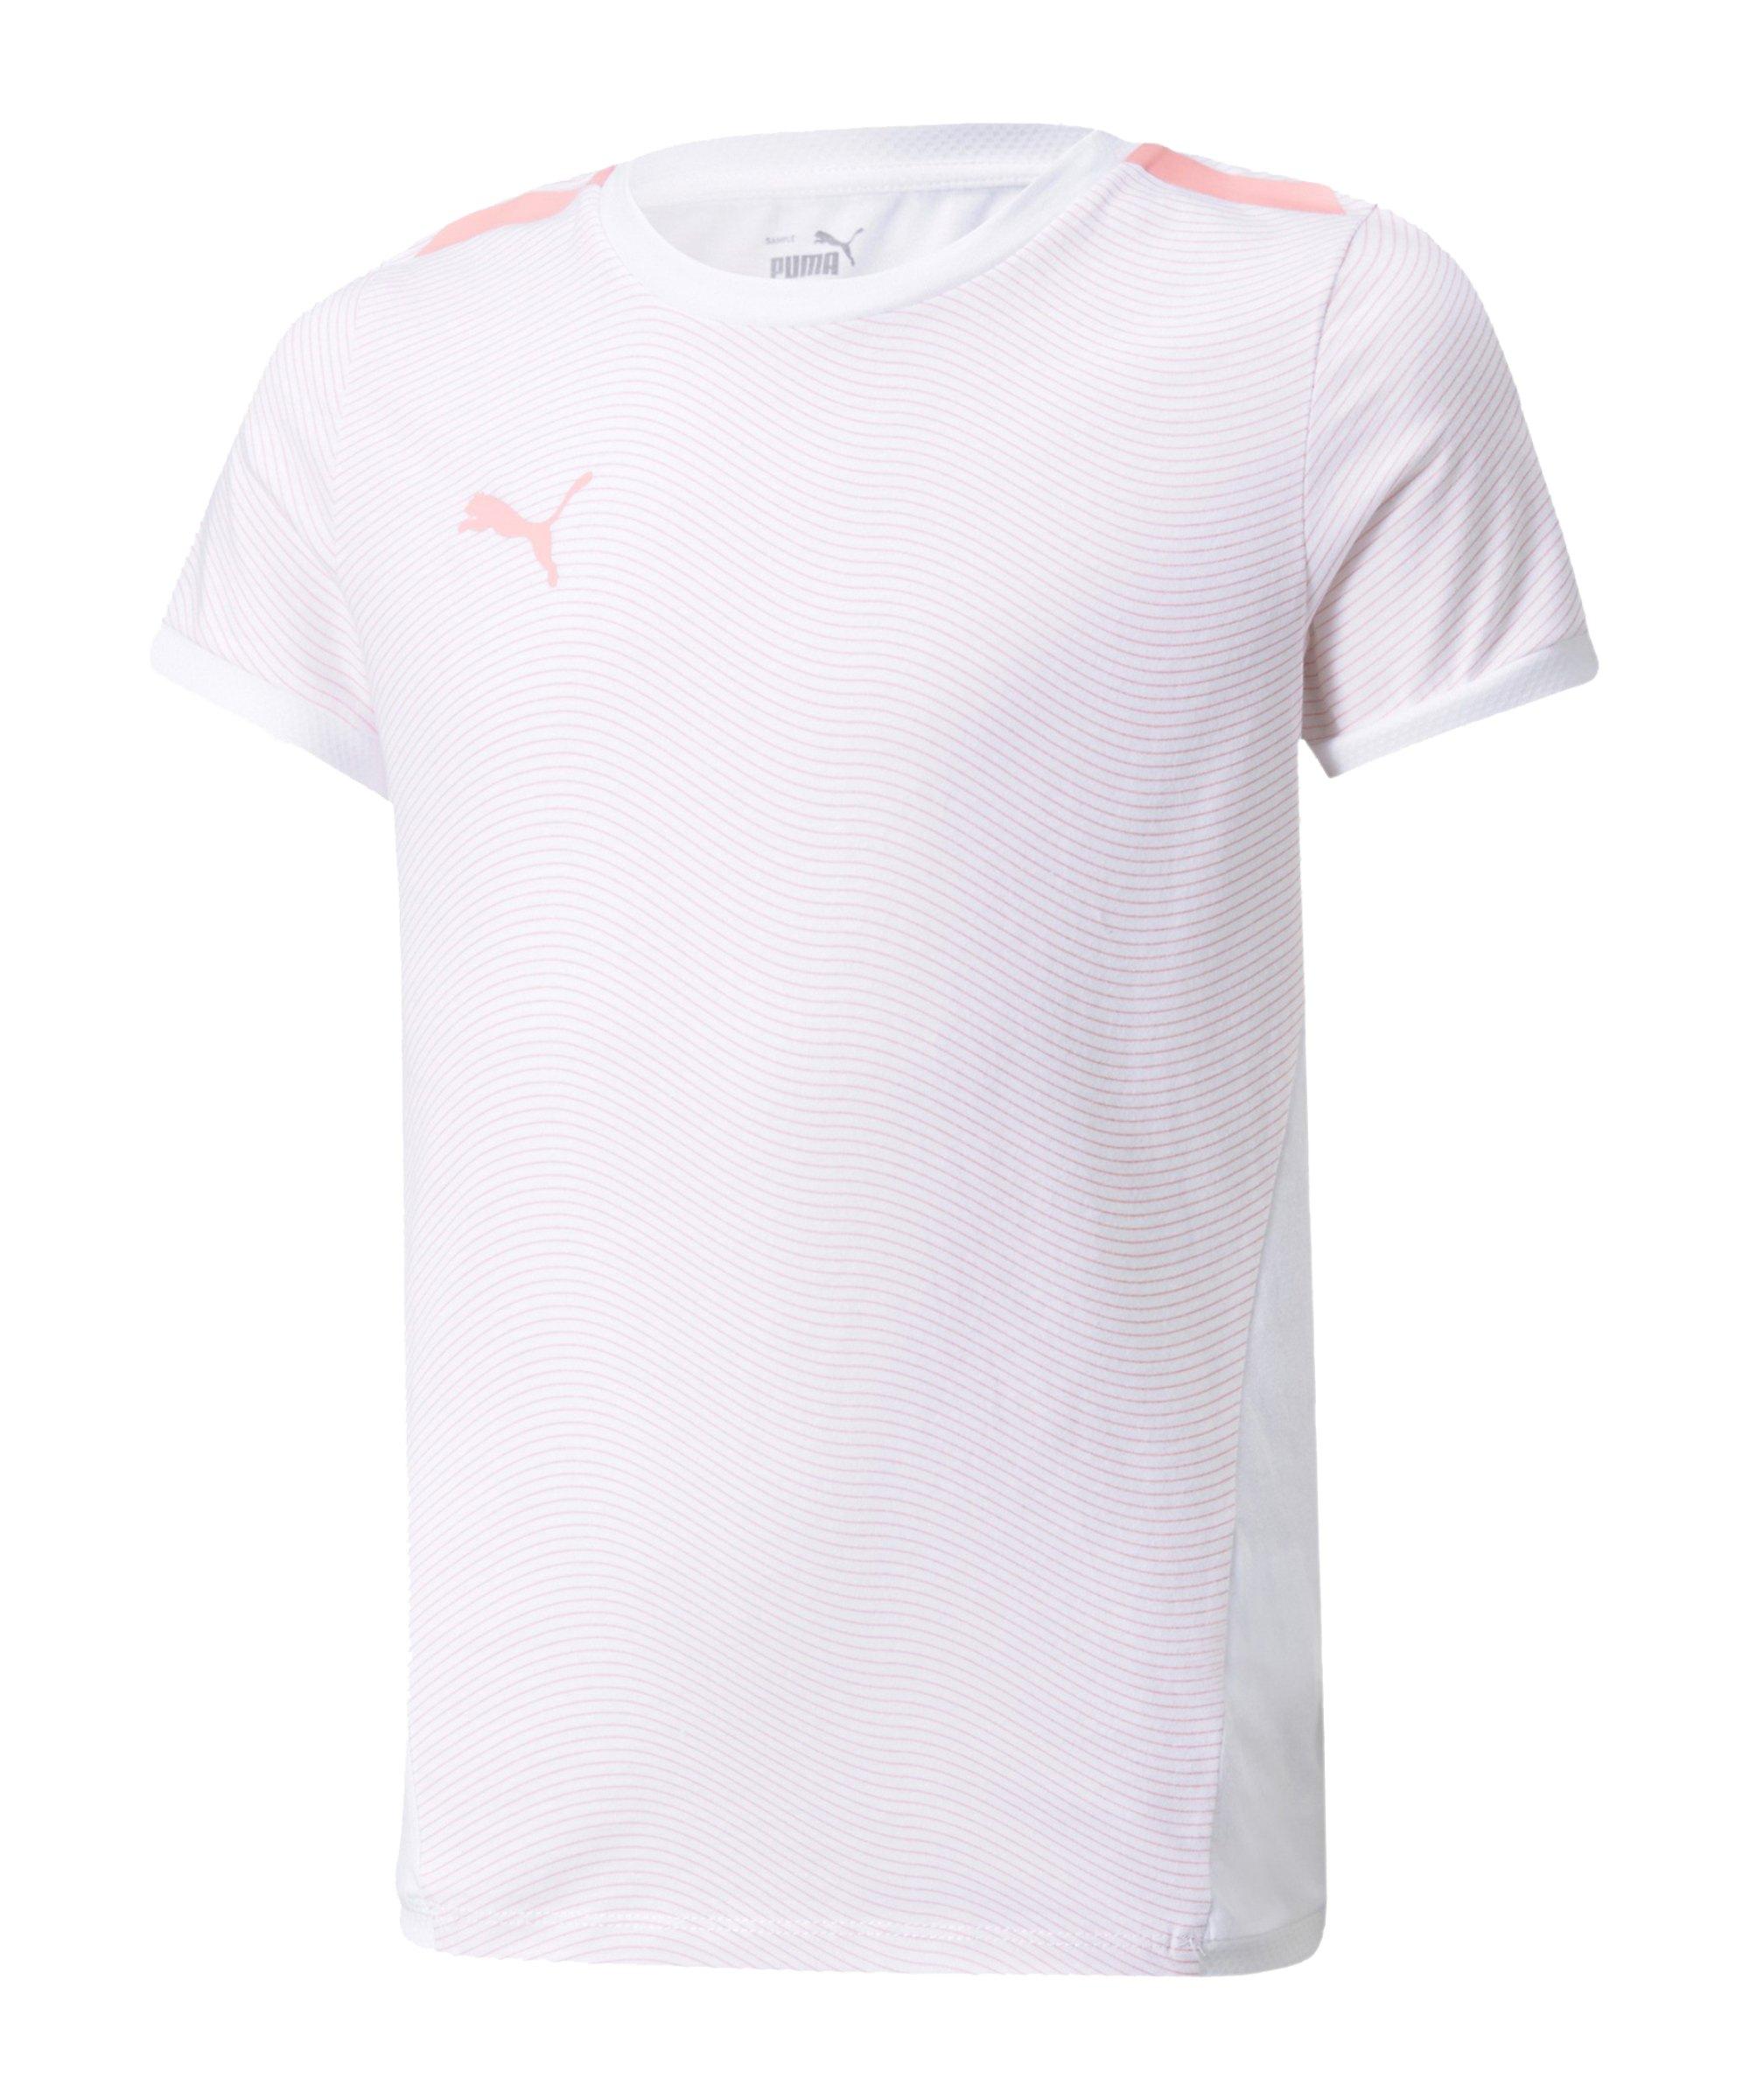 PUMA individualLIGA T-Shirt Kids Weiss Pink F01 - weiss